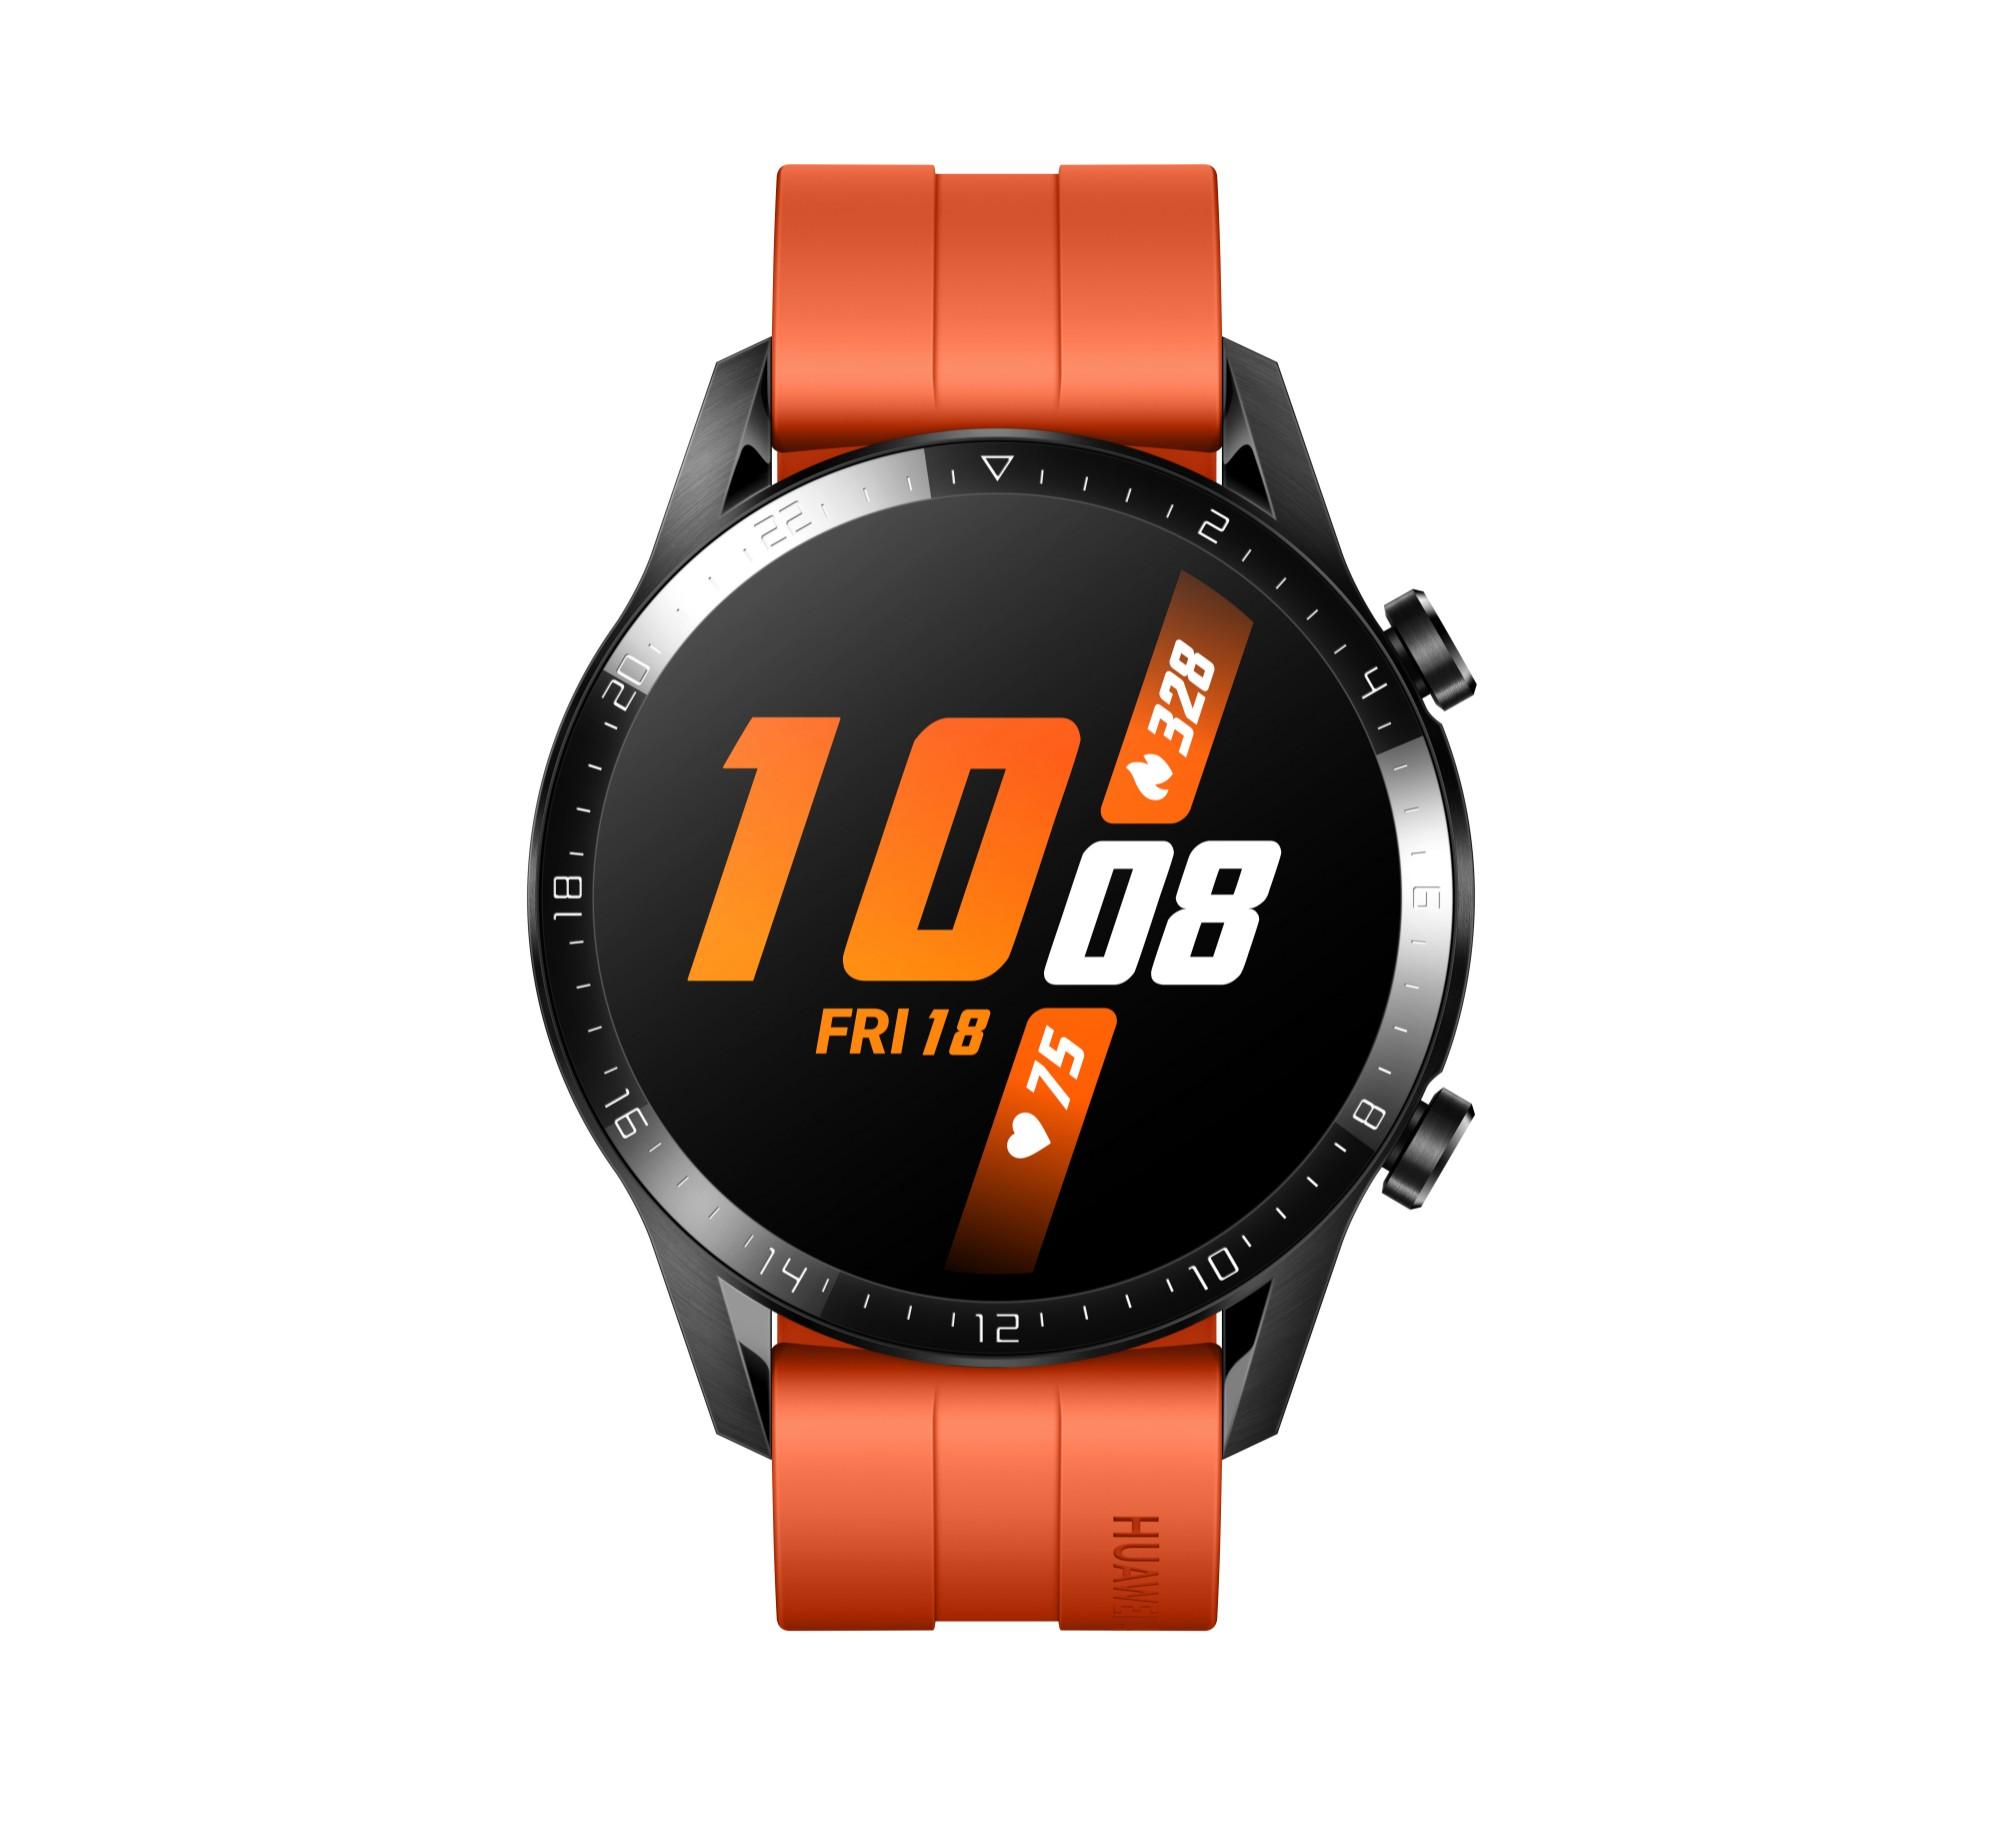 Huawei WATCH GT 2 smartwatch Black AMOLED 3.53 cm (1.39